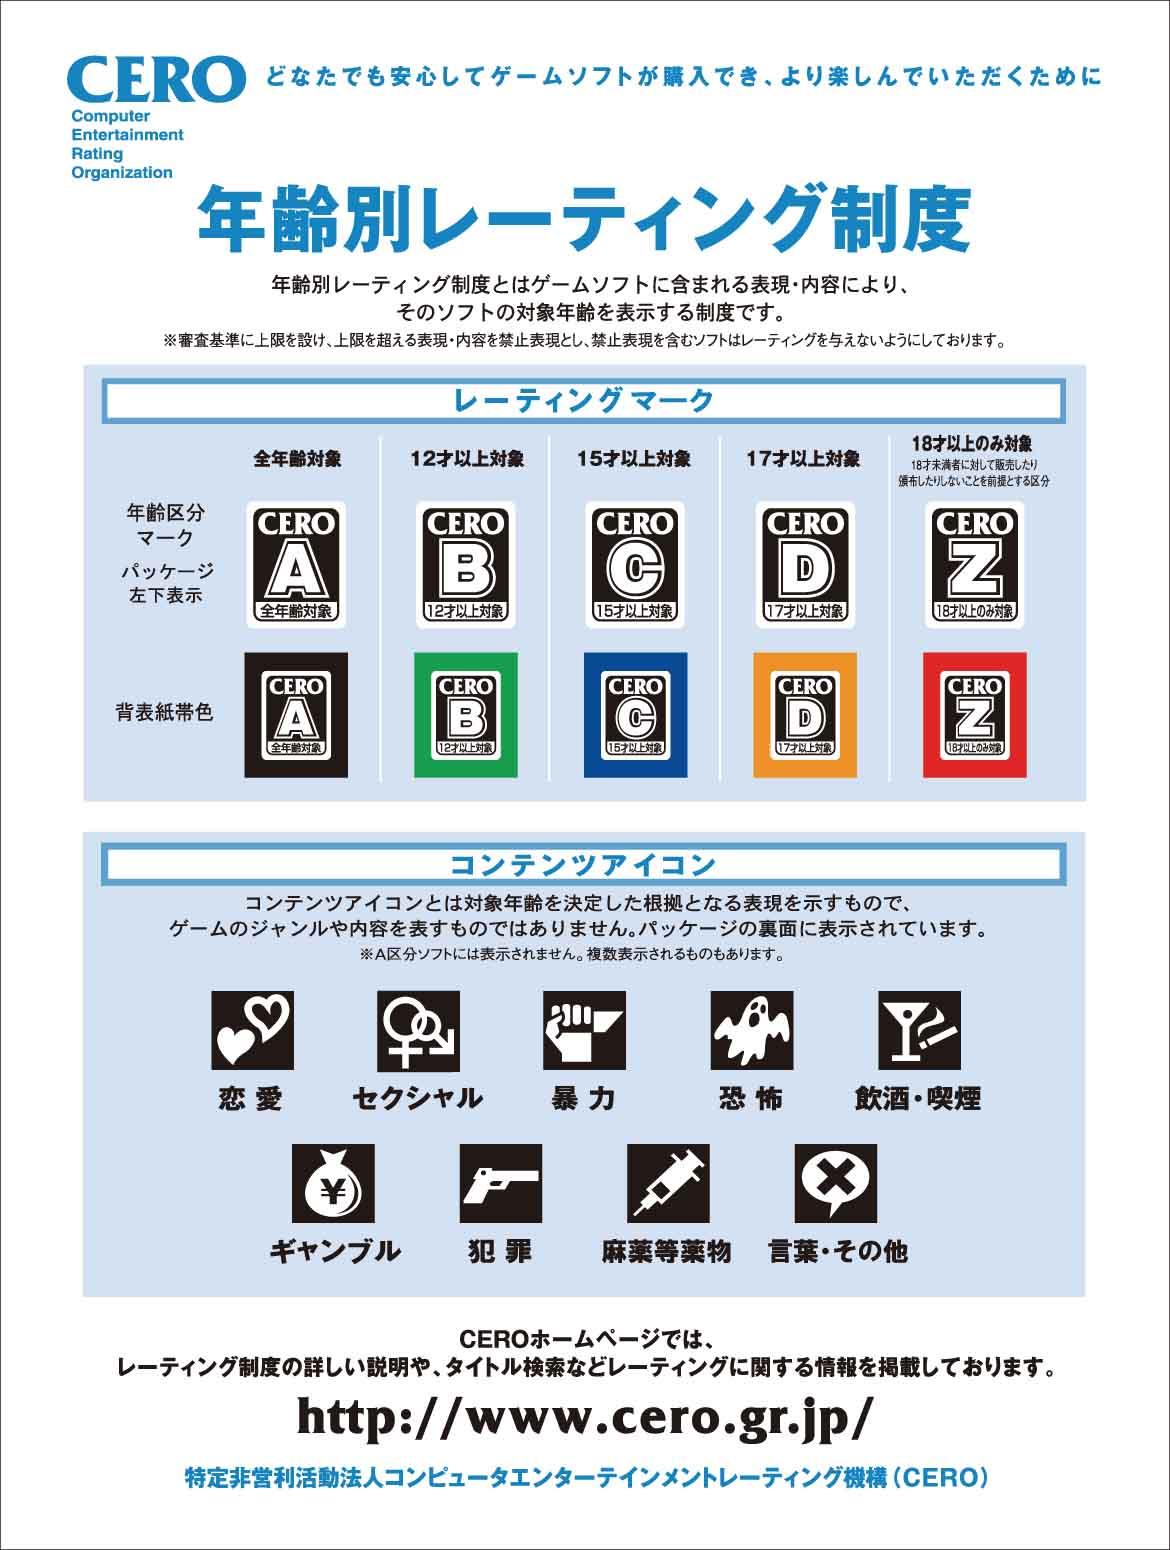 CEROレーティング17才以上対象ソフトの一覧 - JapaneseClass.jp